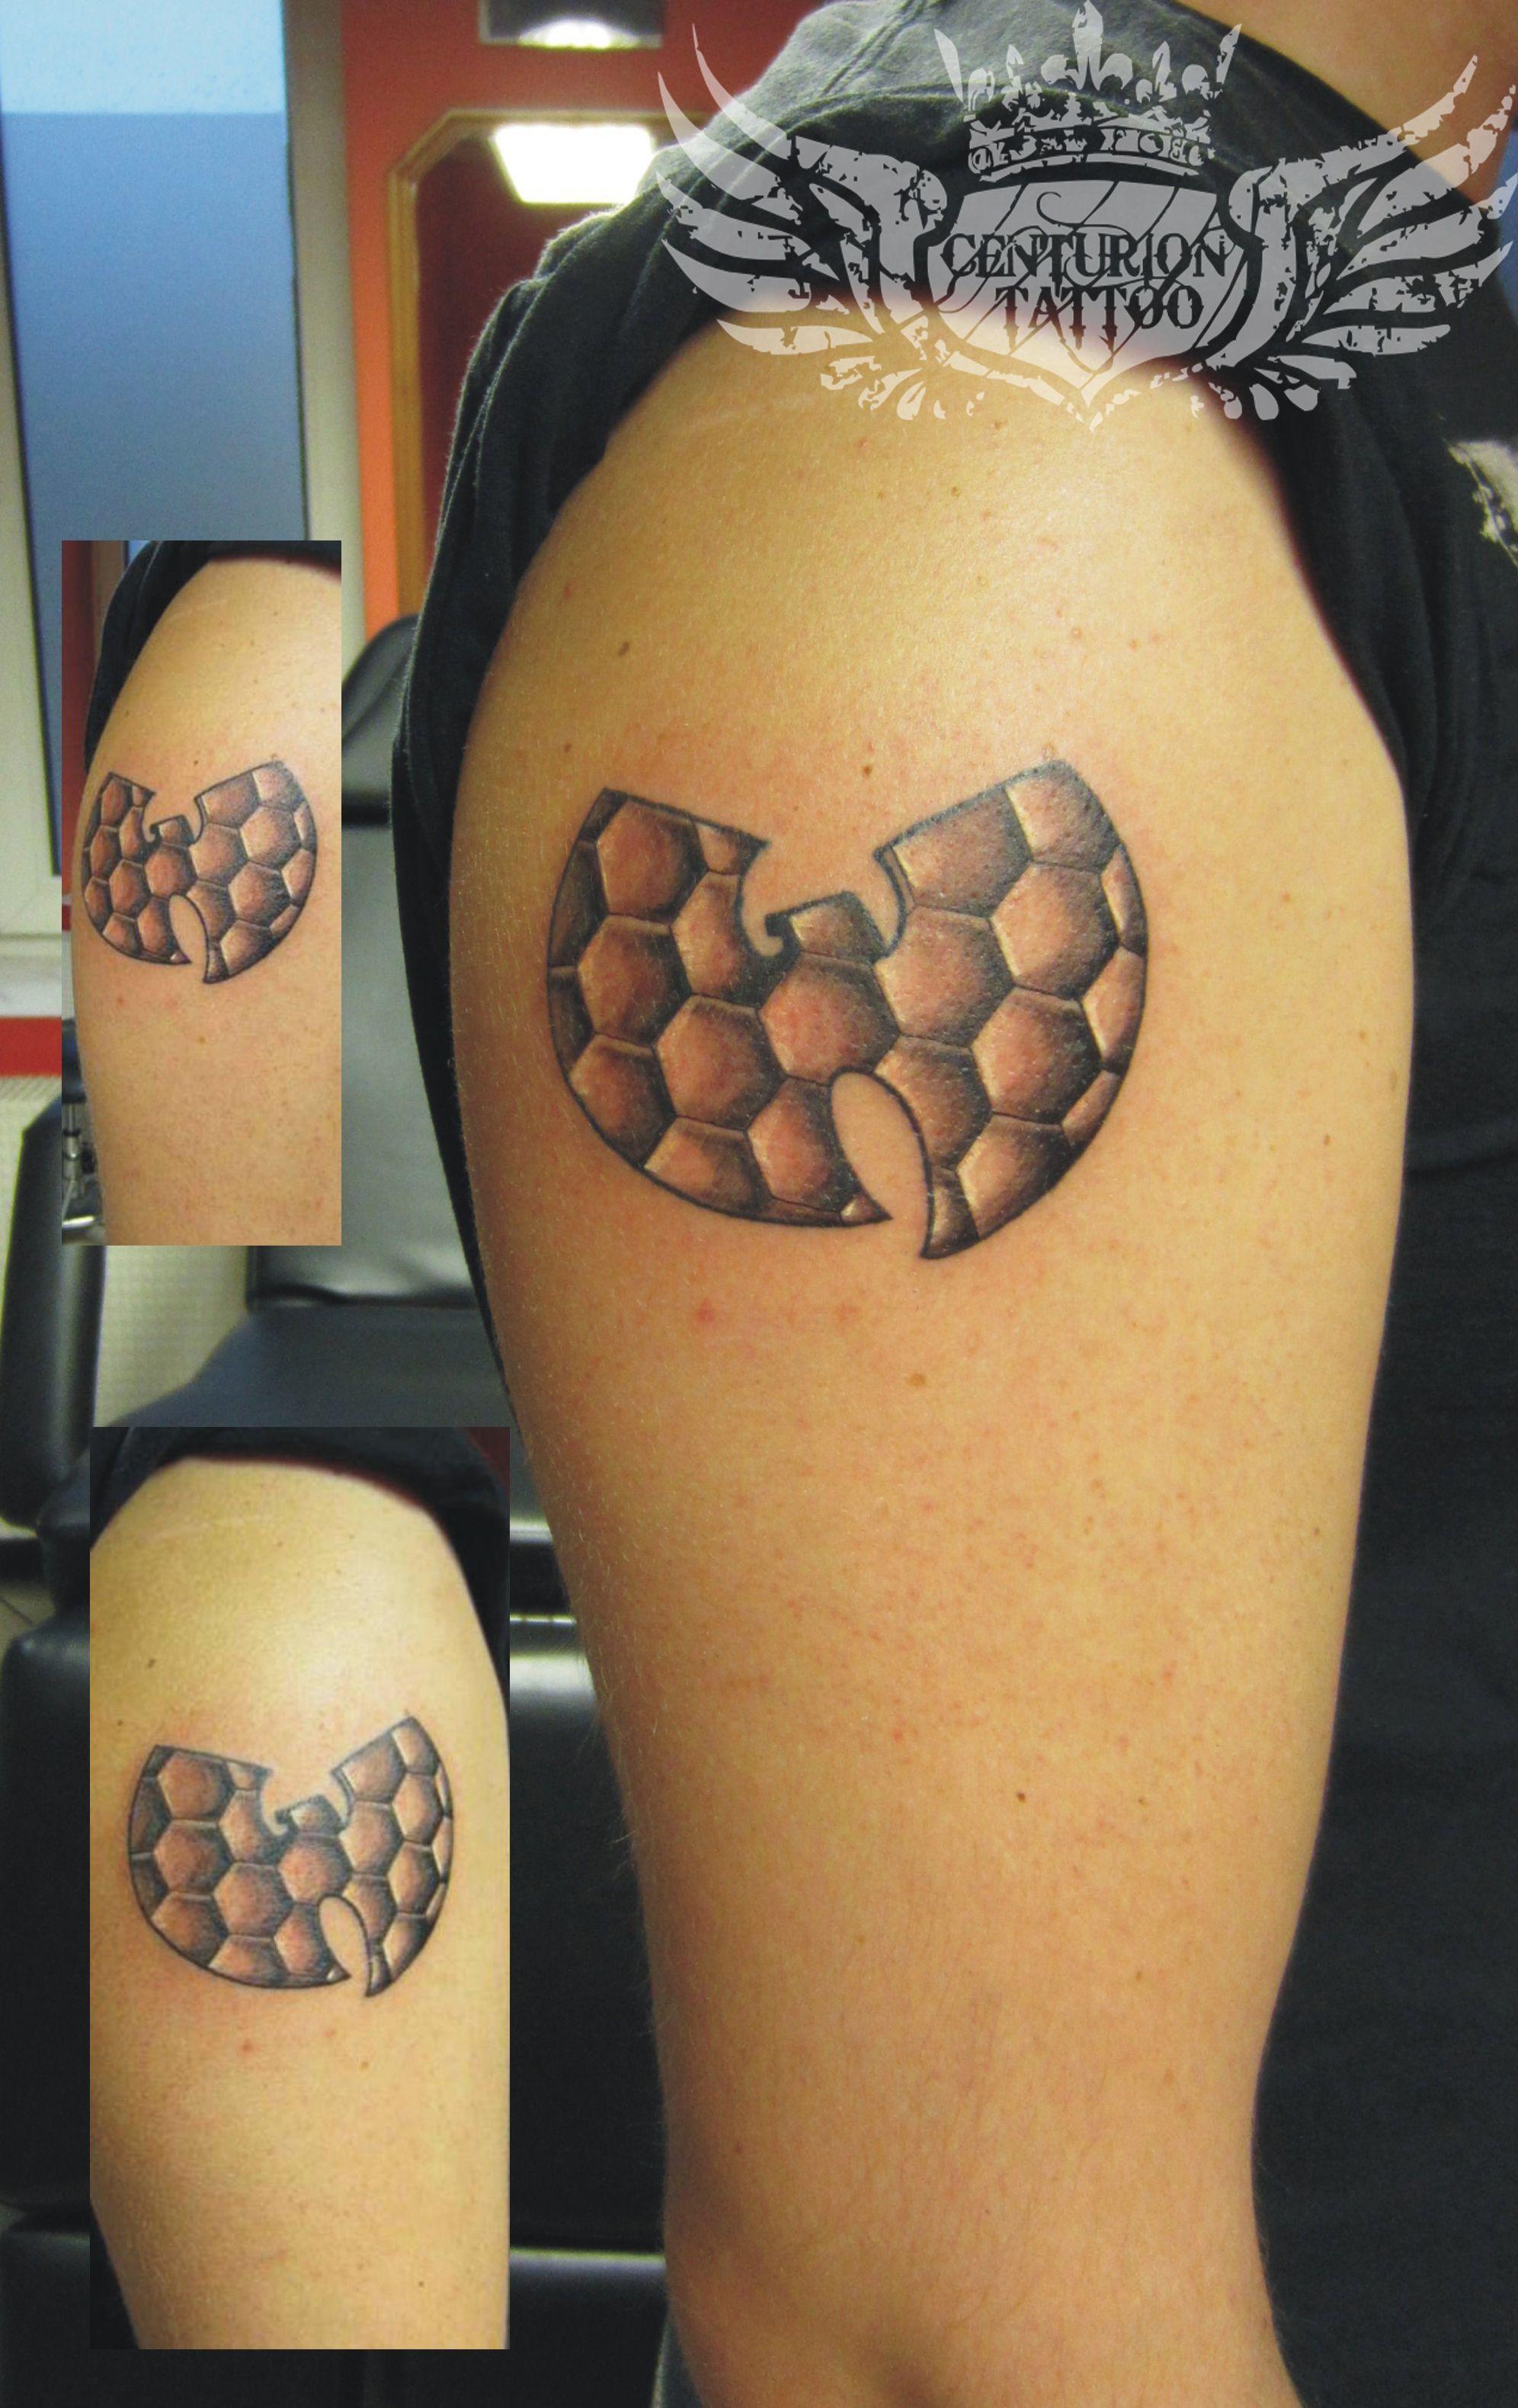 Wu tang clan logo tattoo tattoos pinterest wu tang for Method man tattoo